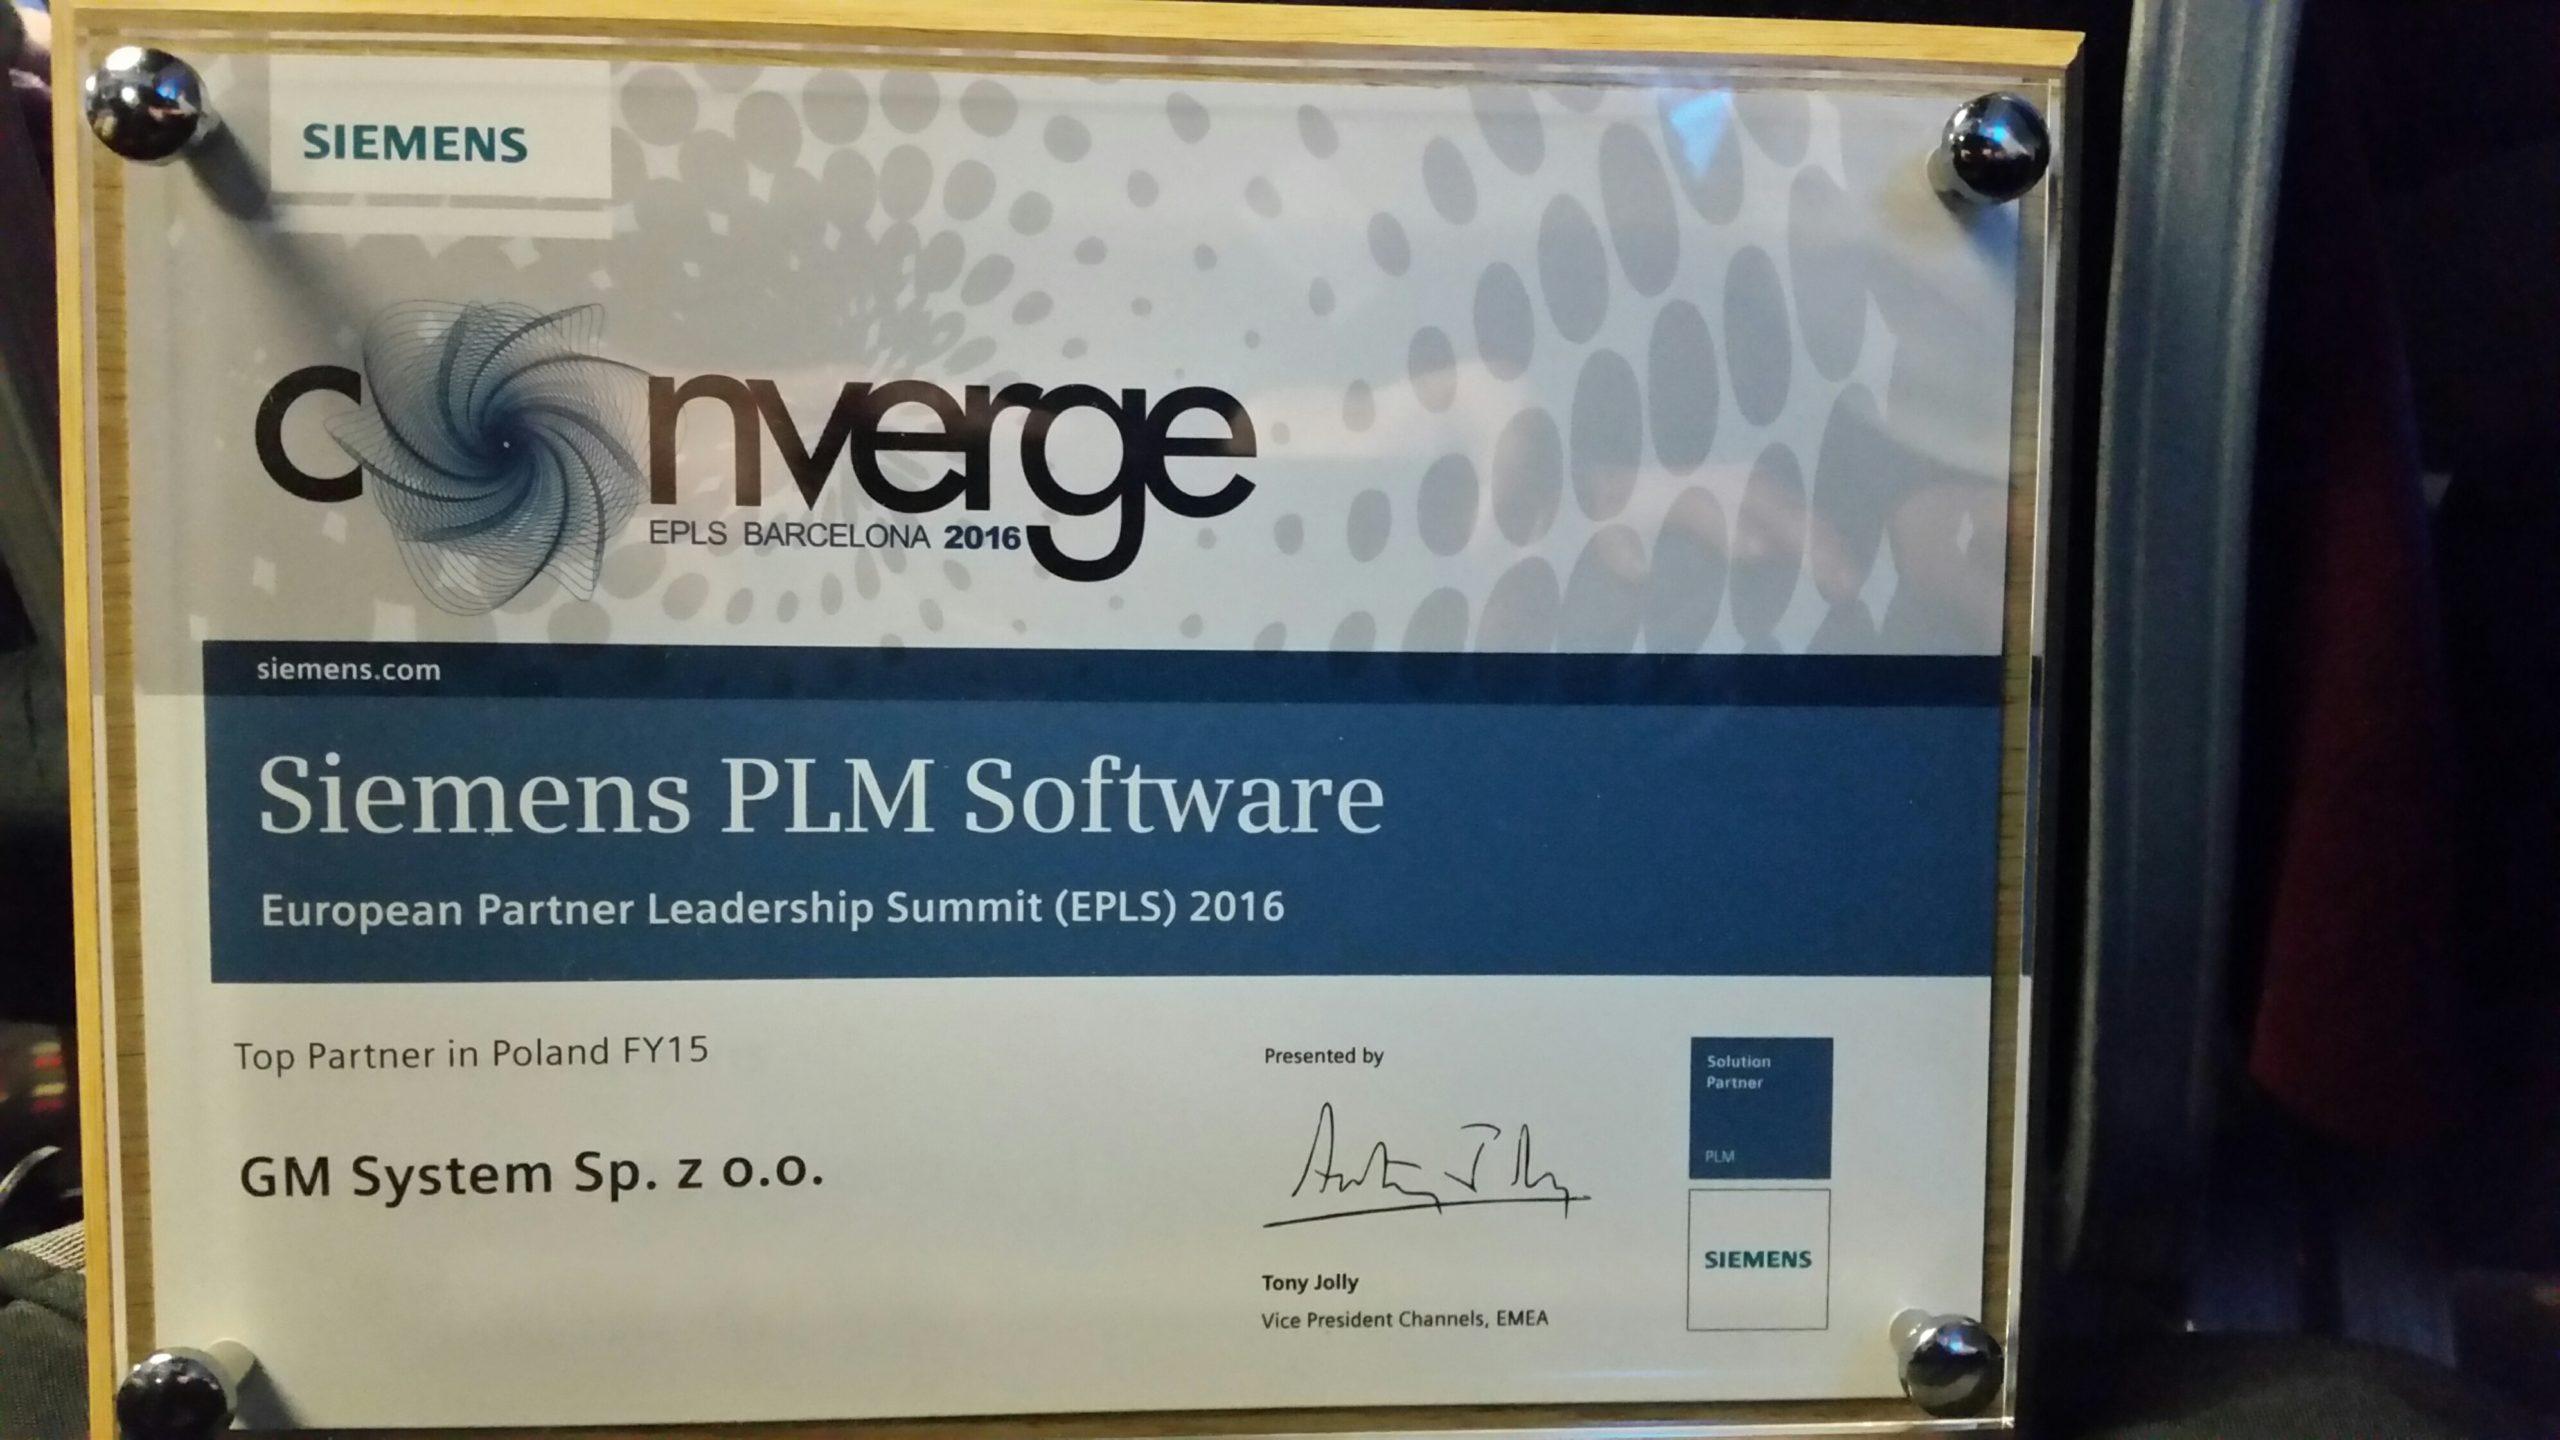 GM System Siemens Top Partner in Poland 2015